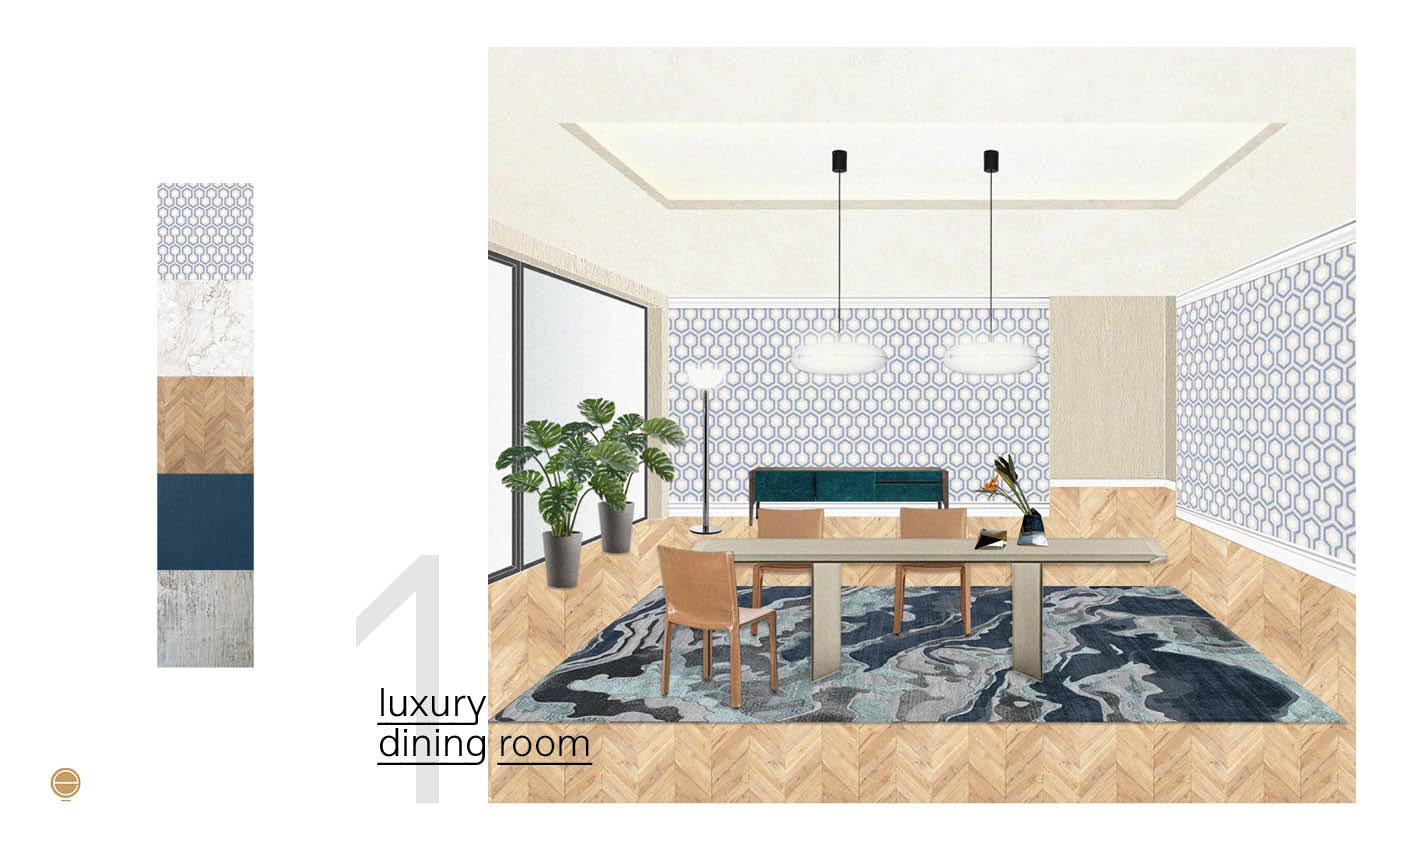 Italian luxury dining room furniture inspiration